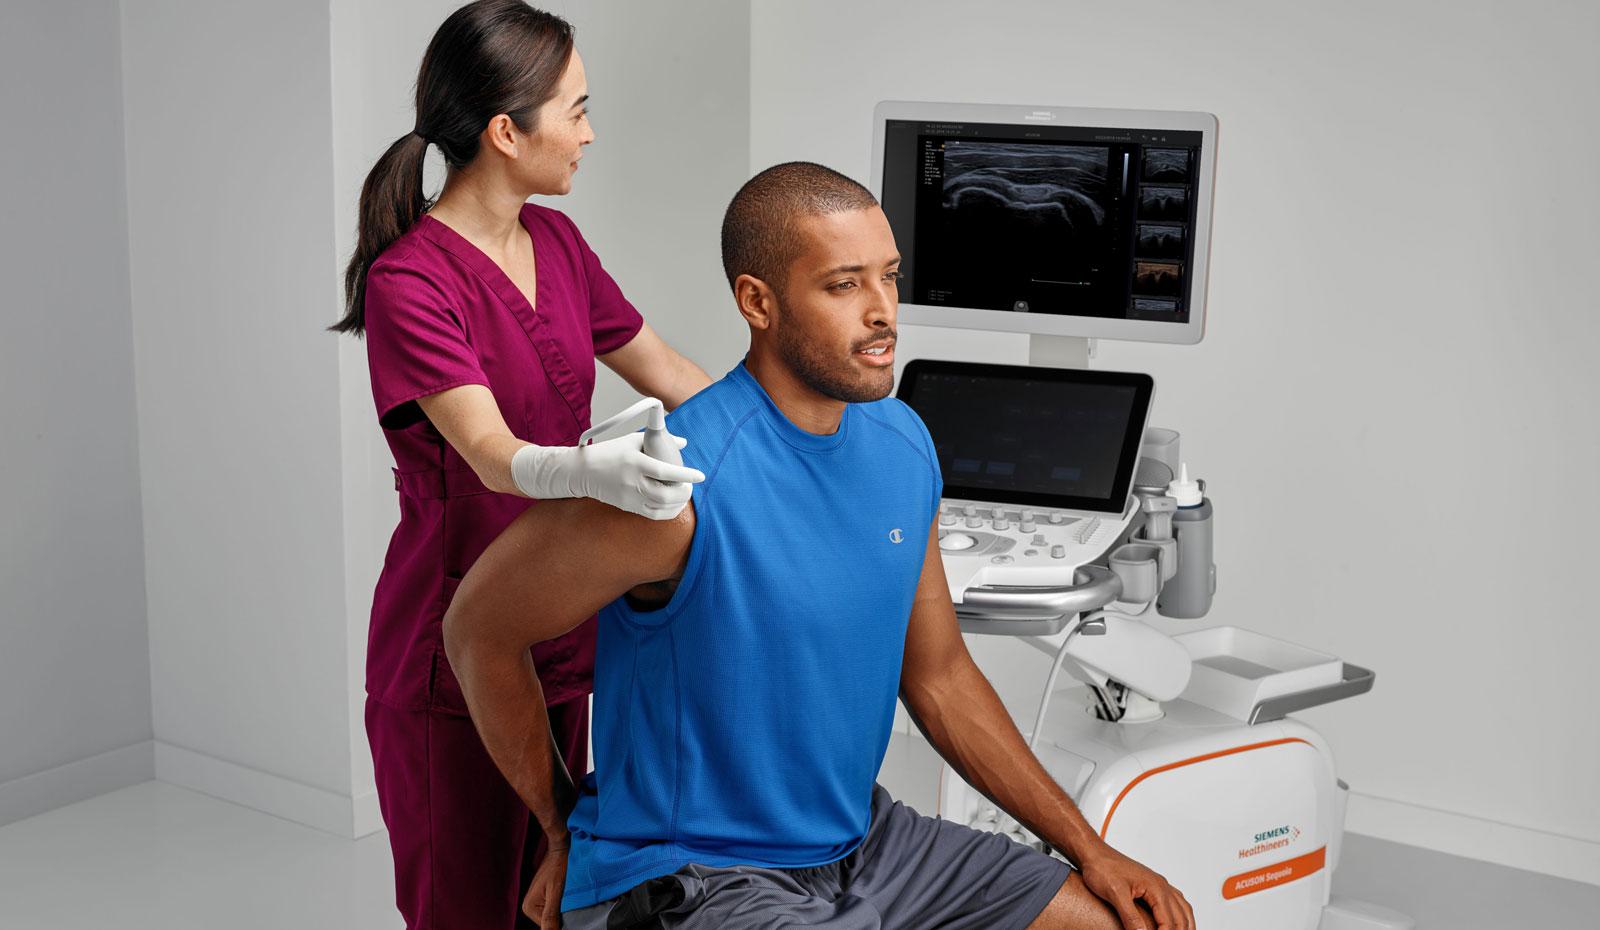 Sonographer using ultrasound equipment on patient's shoulder